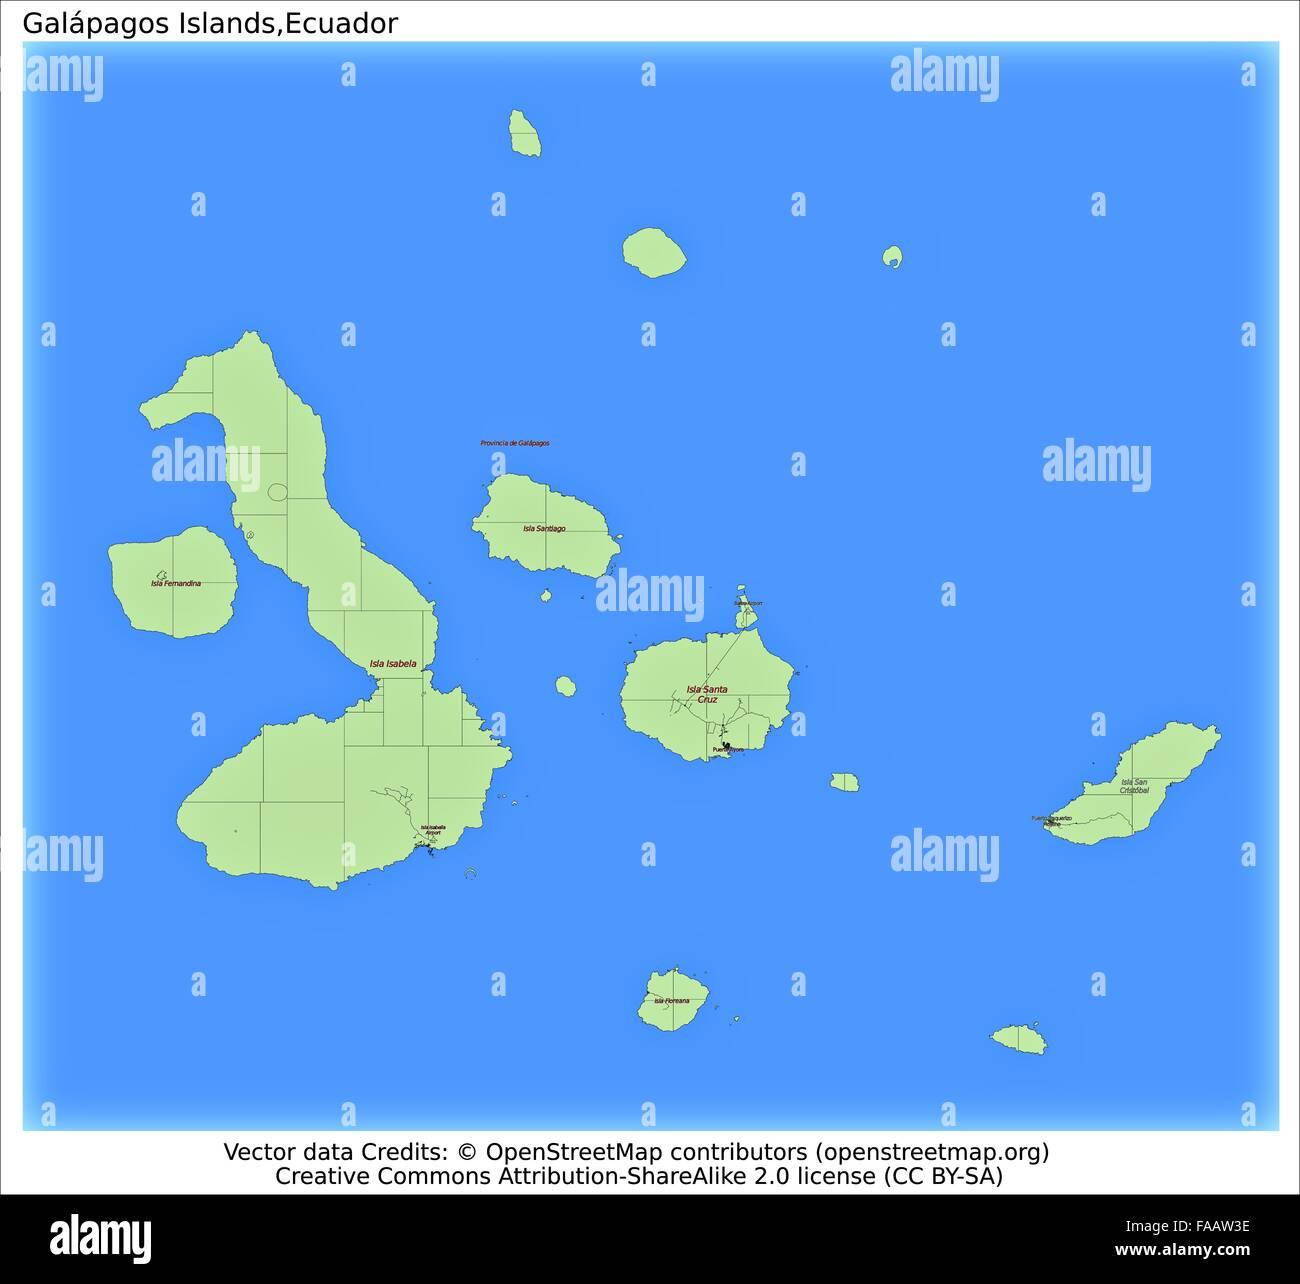 Galapagos Islands Ecuador Map Stock Photo Royalty Free Image - Galapagos map